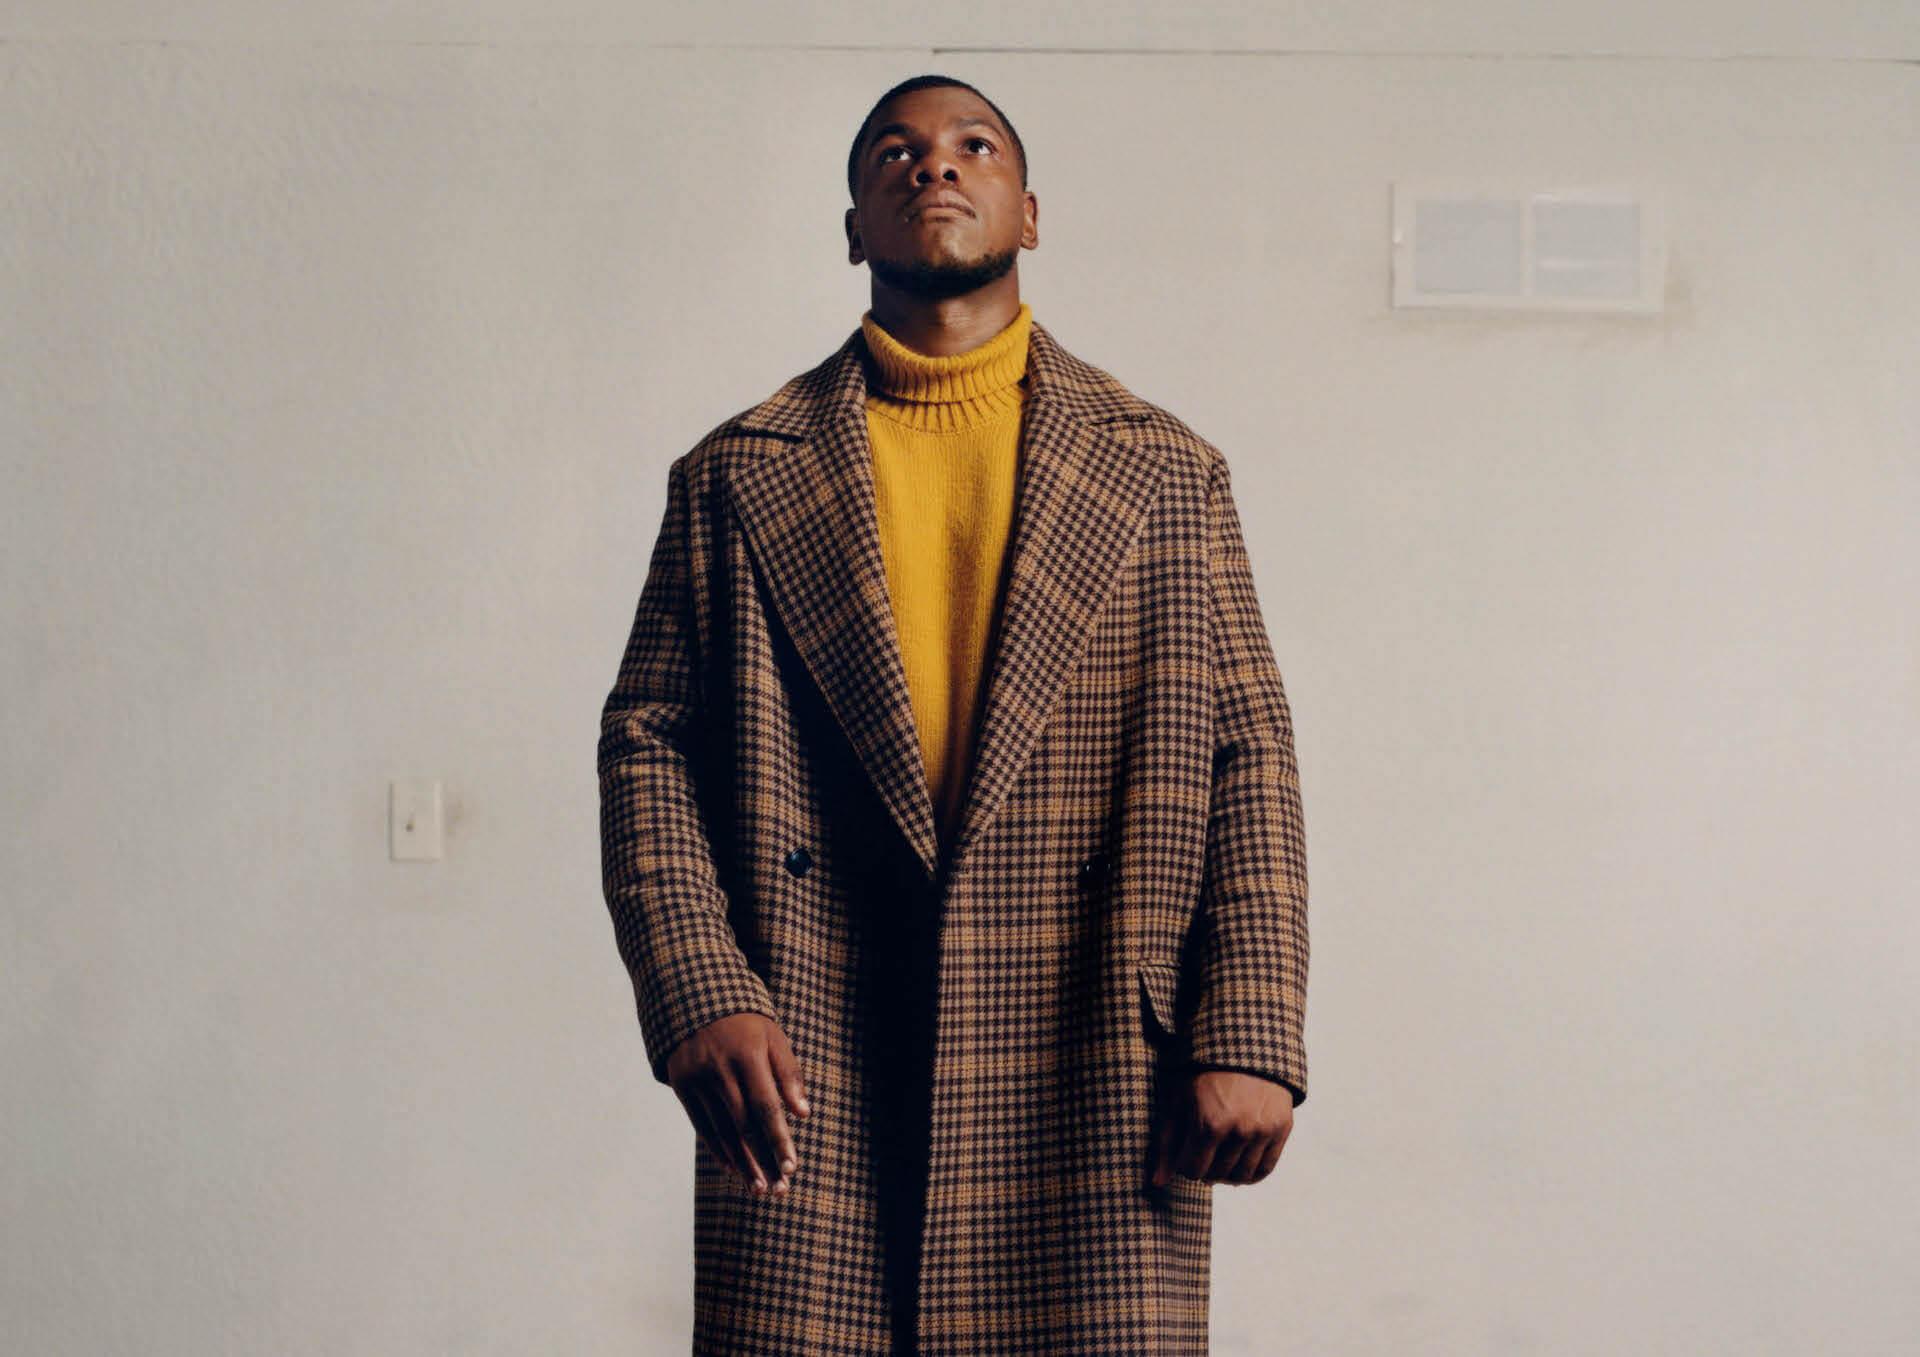 H&Mが俳優のジョン・ボイエガとタッグを組んだメンズウェアコレクションを発表!リサイクル素材、オーガニック素材を使用したアイテムが登場 life211006_handm_john_boyega_01